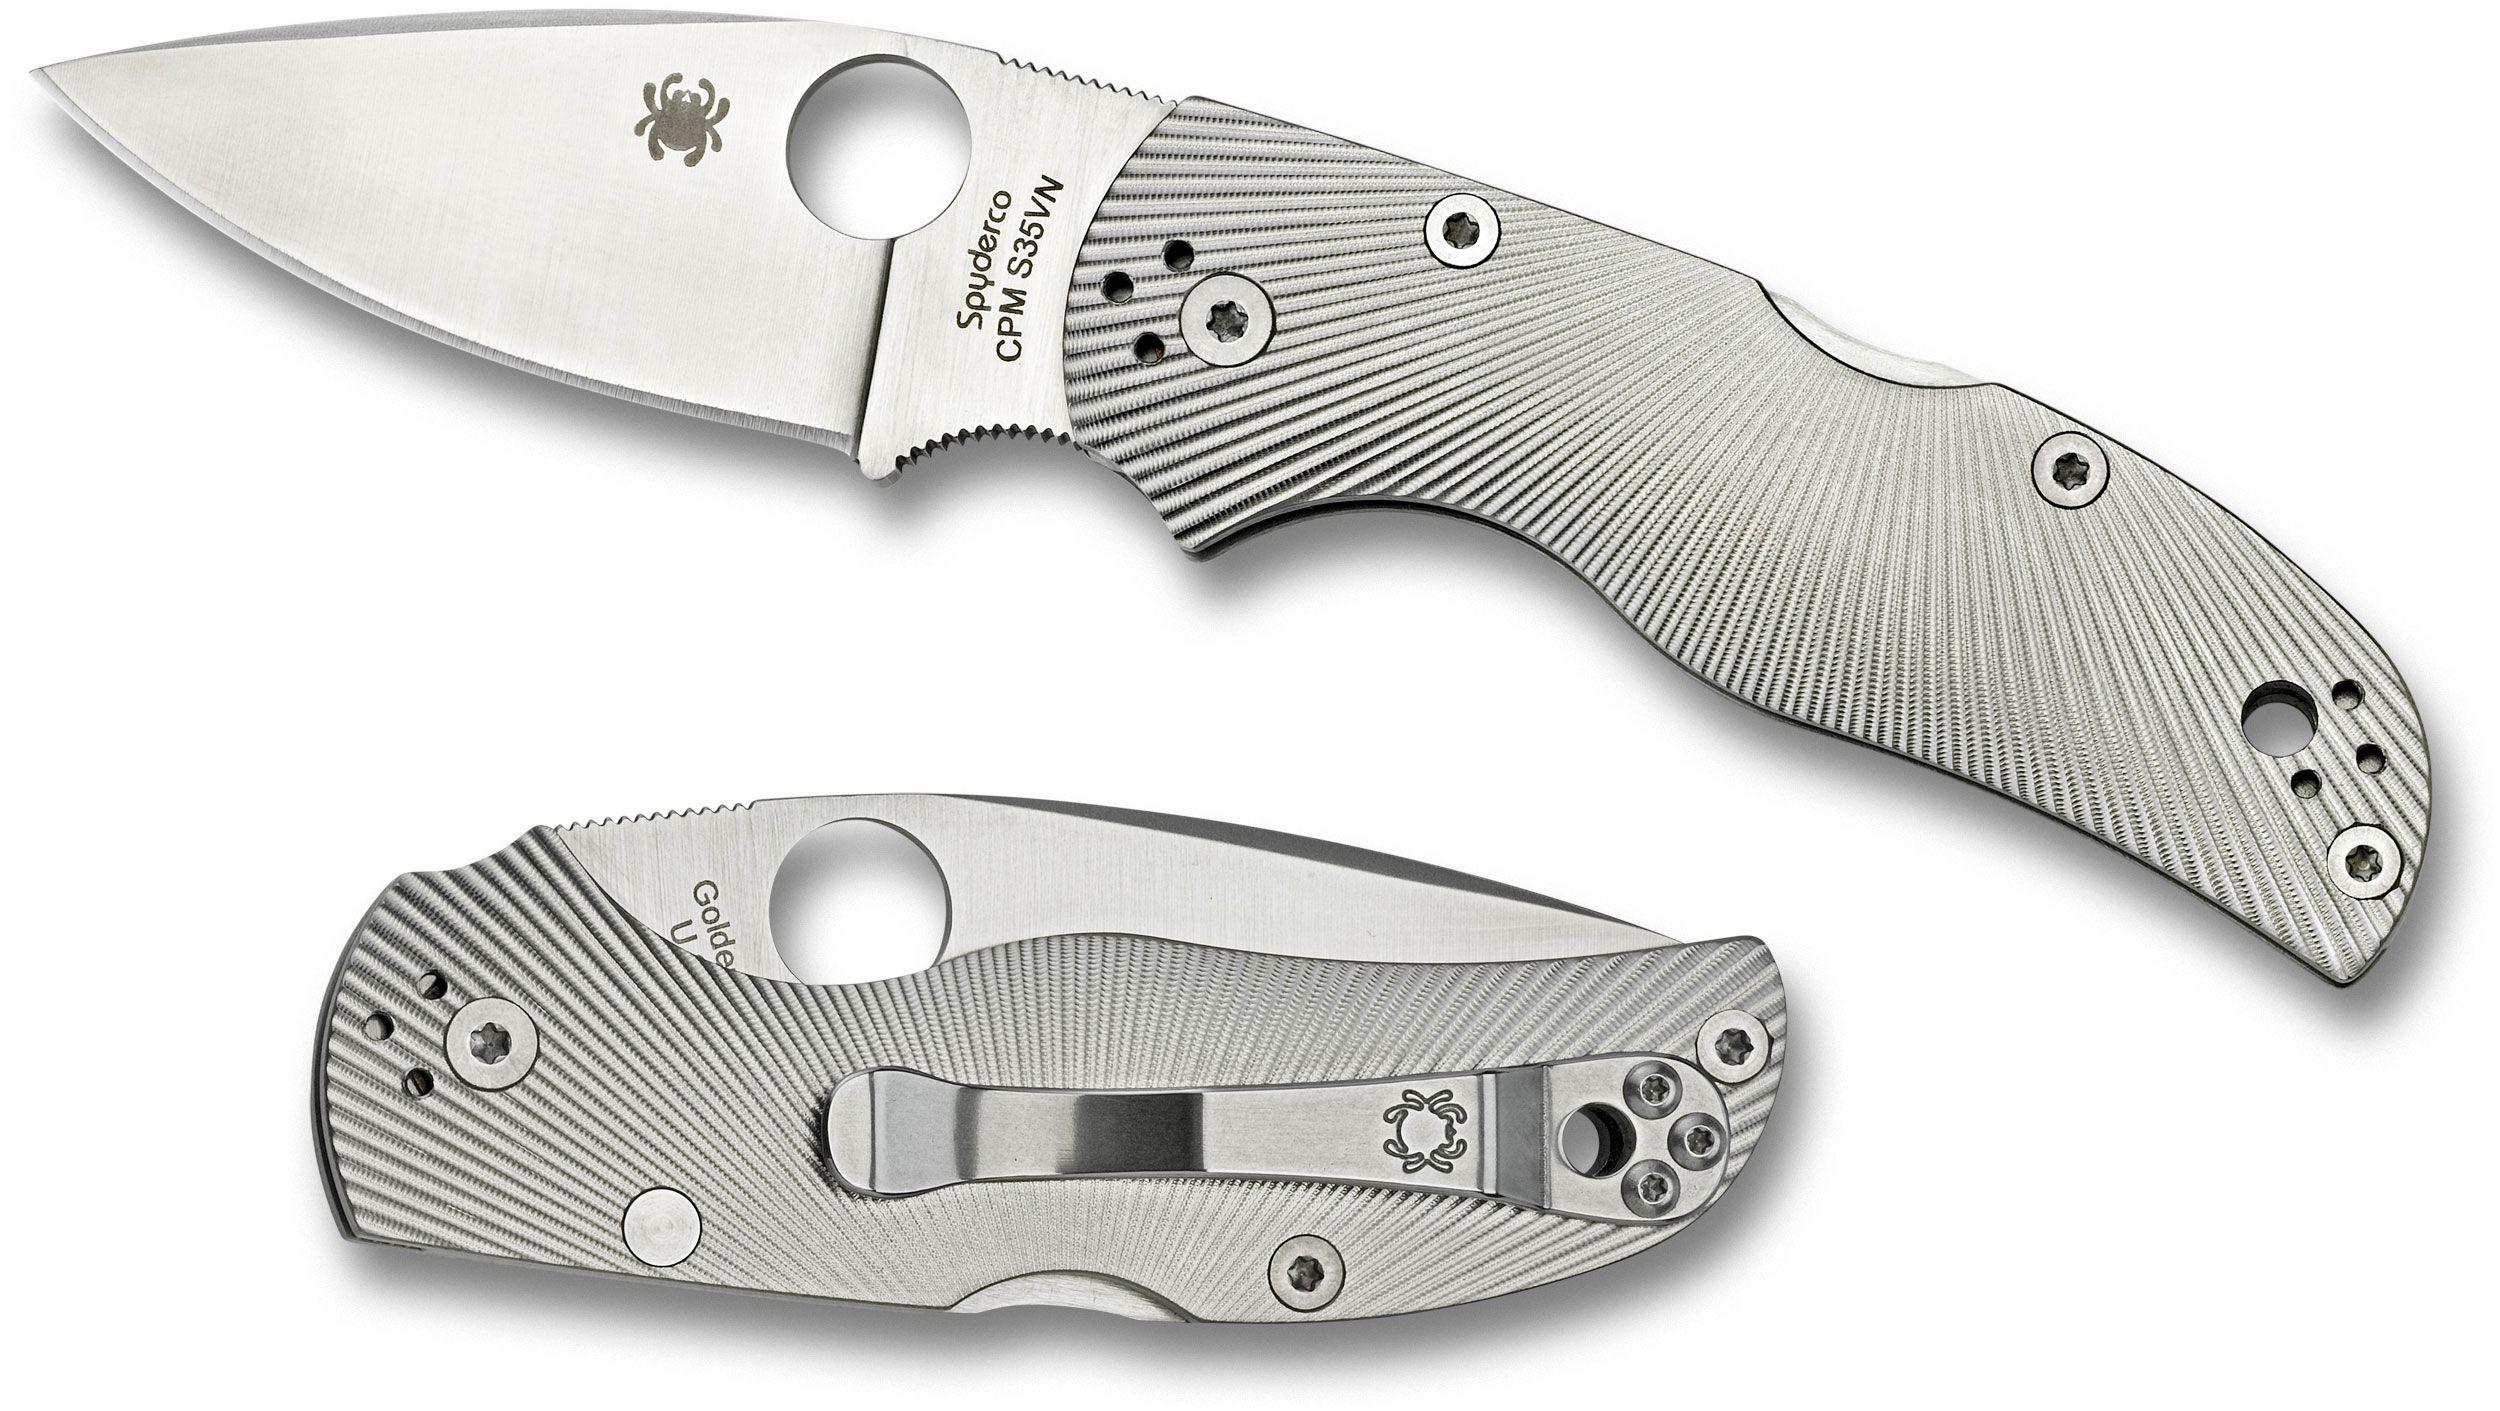 Spyderco C41TIFP Native 5 Folding Knife 3 inch S35VN Satin Plain Blade, Fluted Titanium Handles